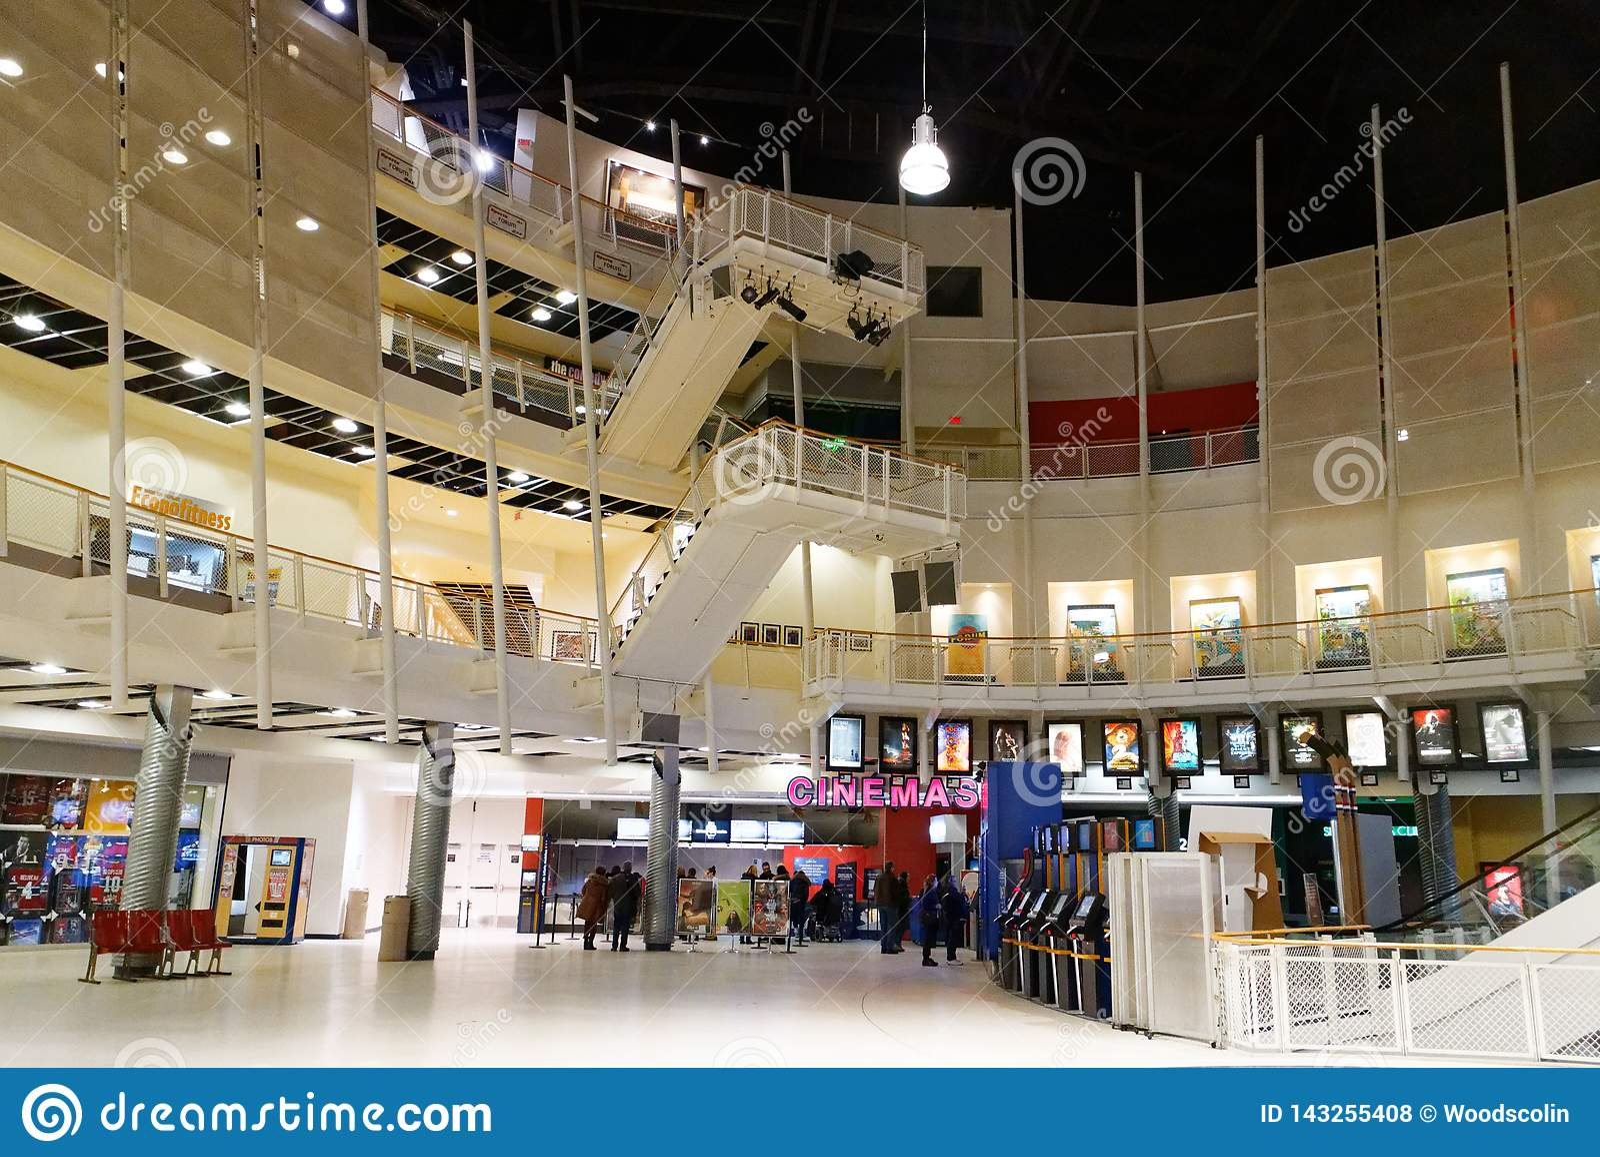 Inside the Montreal Forum cinema